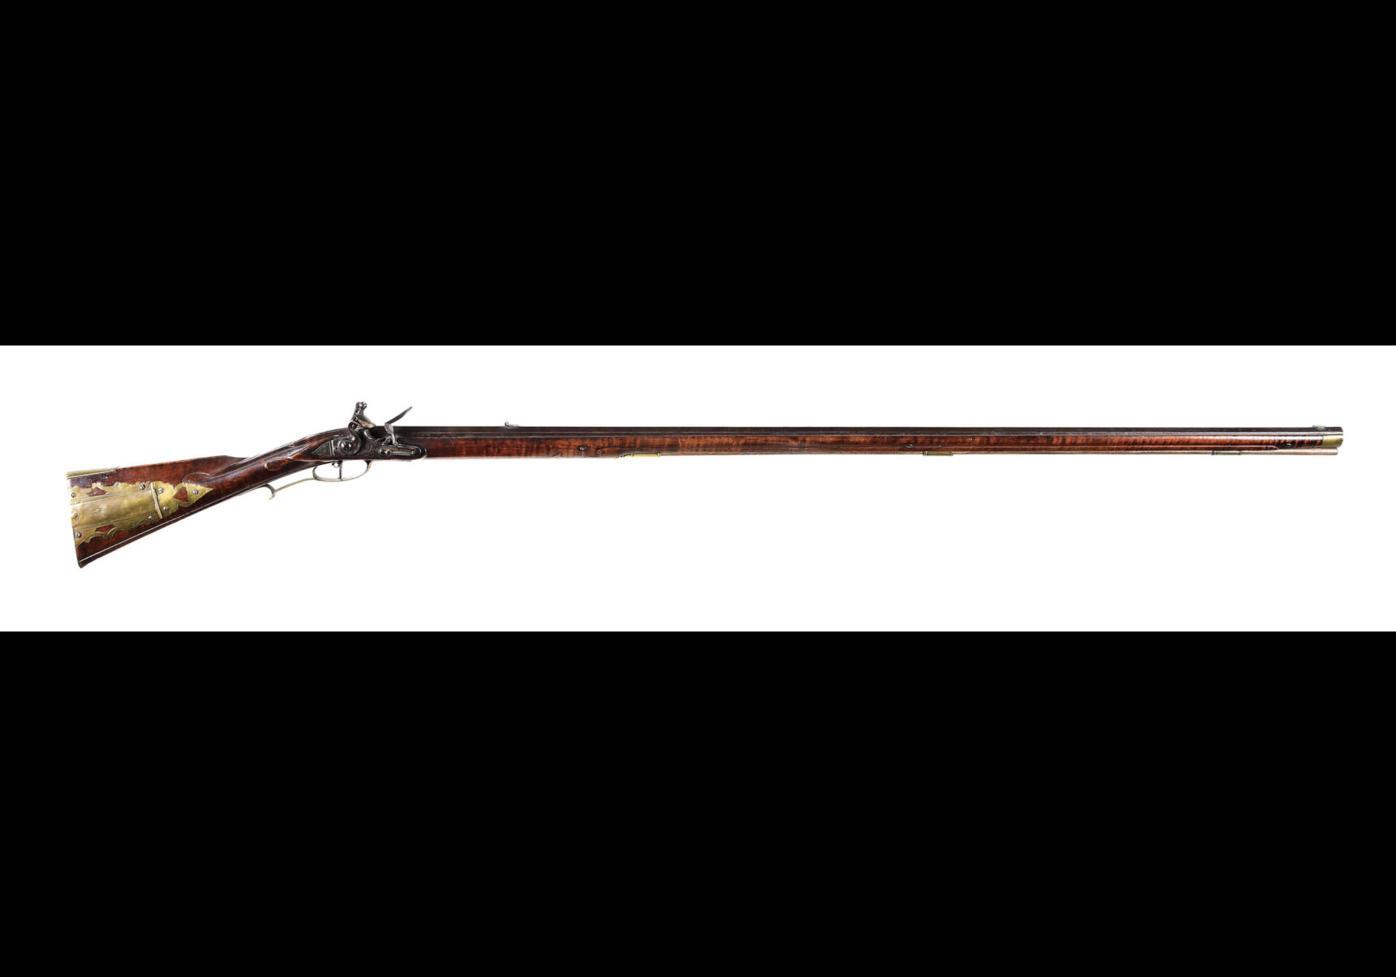 Morphy's Lancaster Kentucky rifle